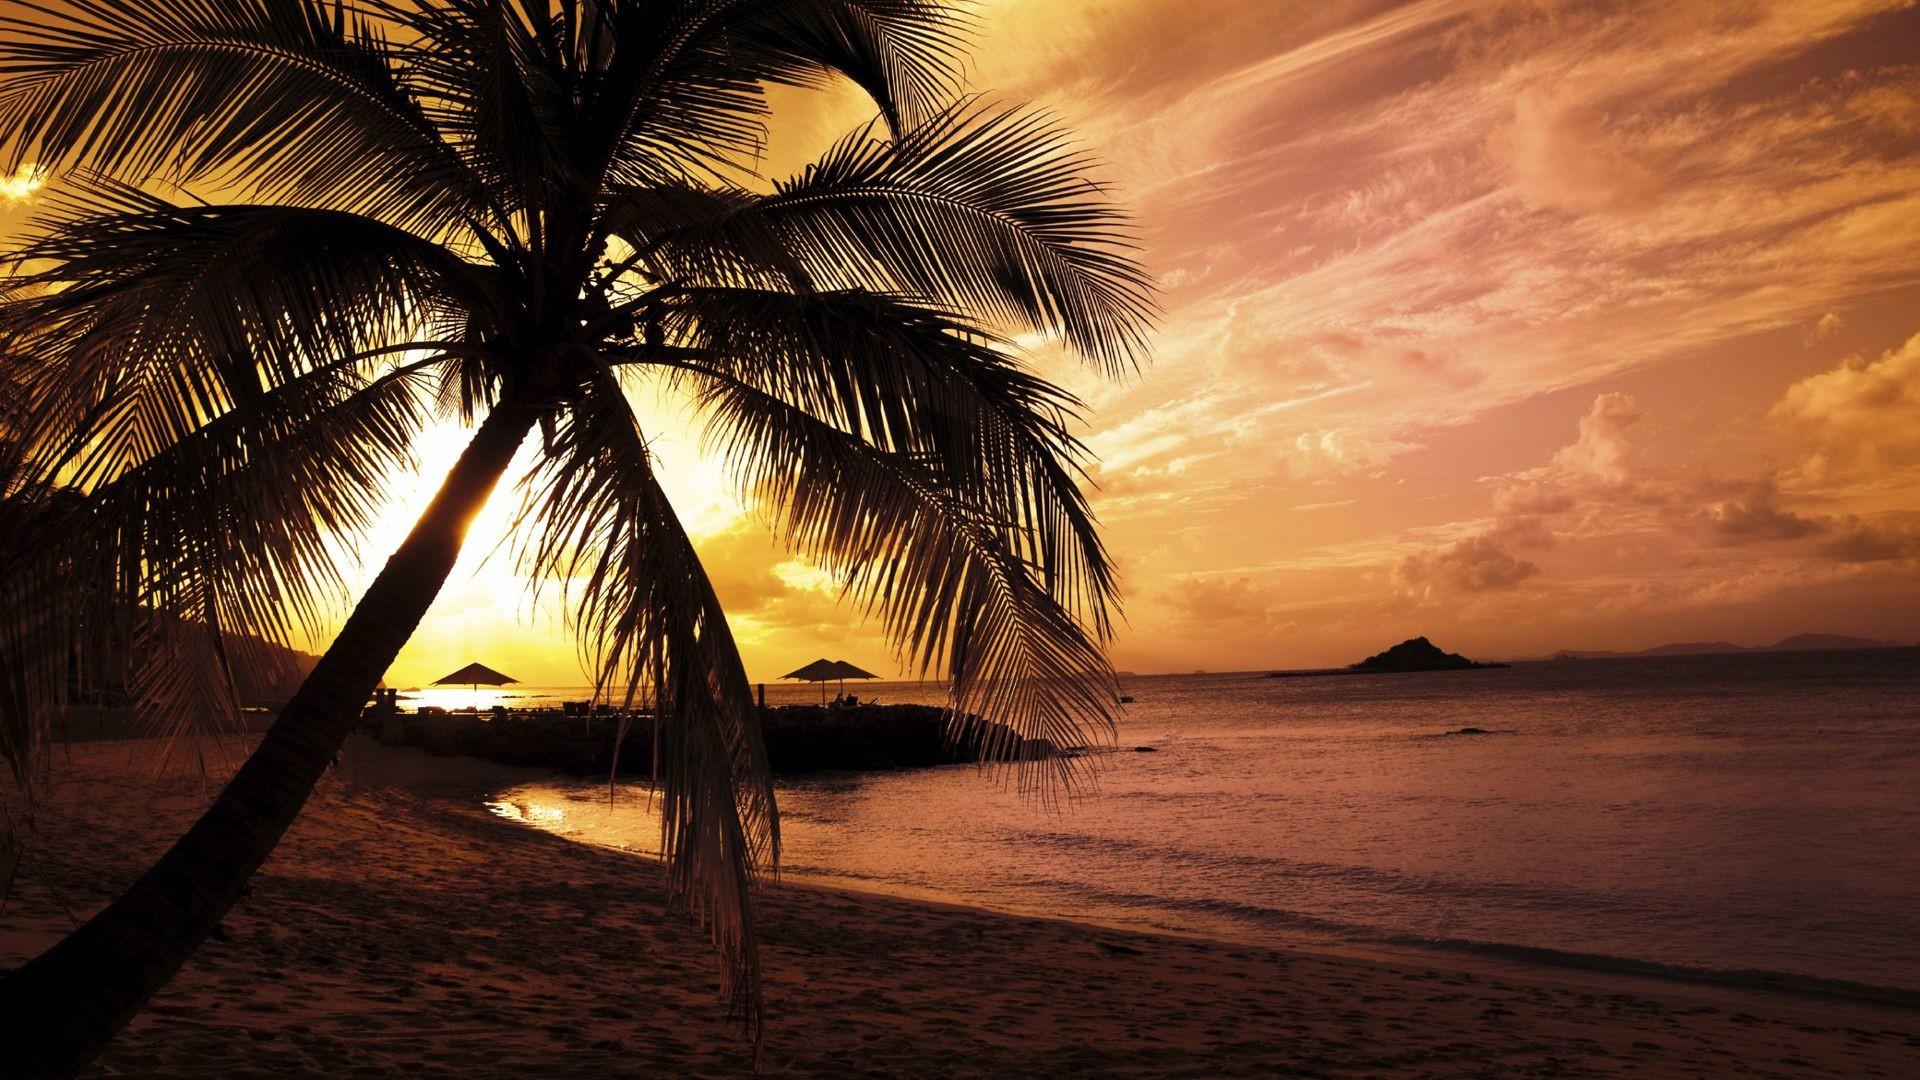 hawaii beach night